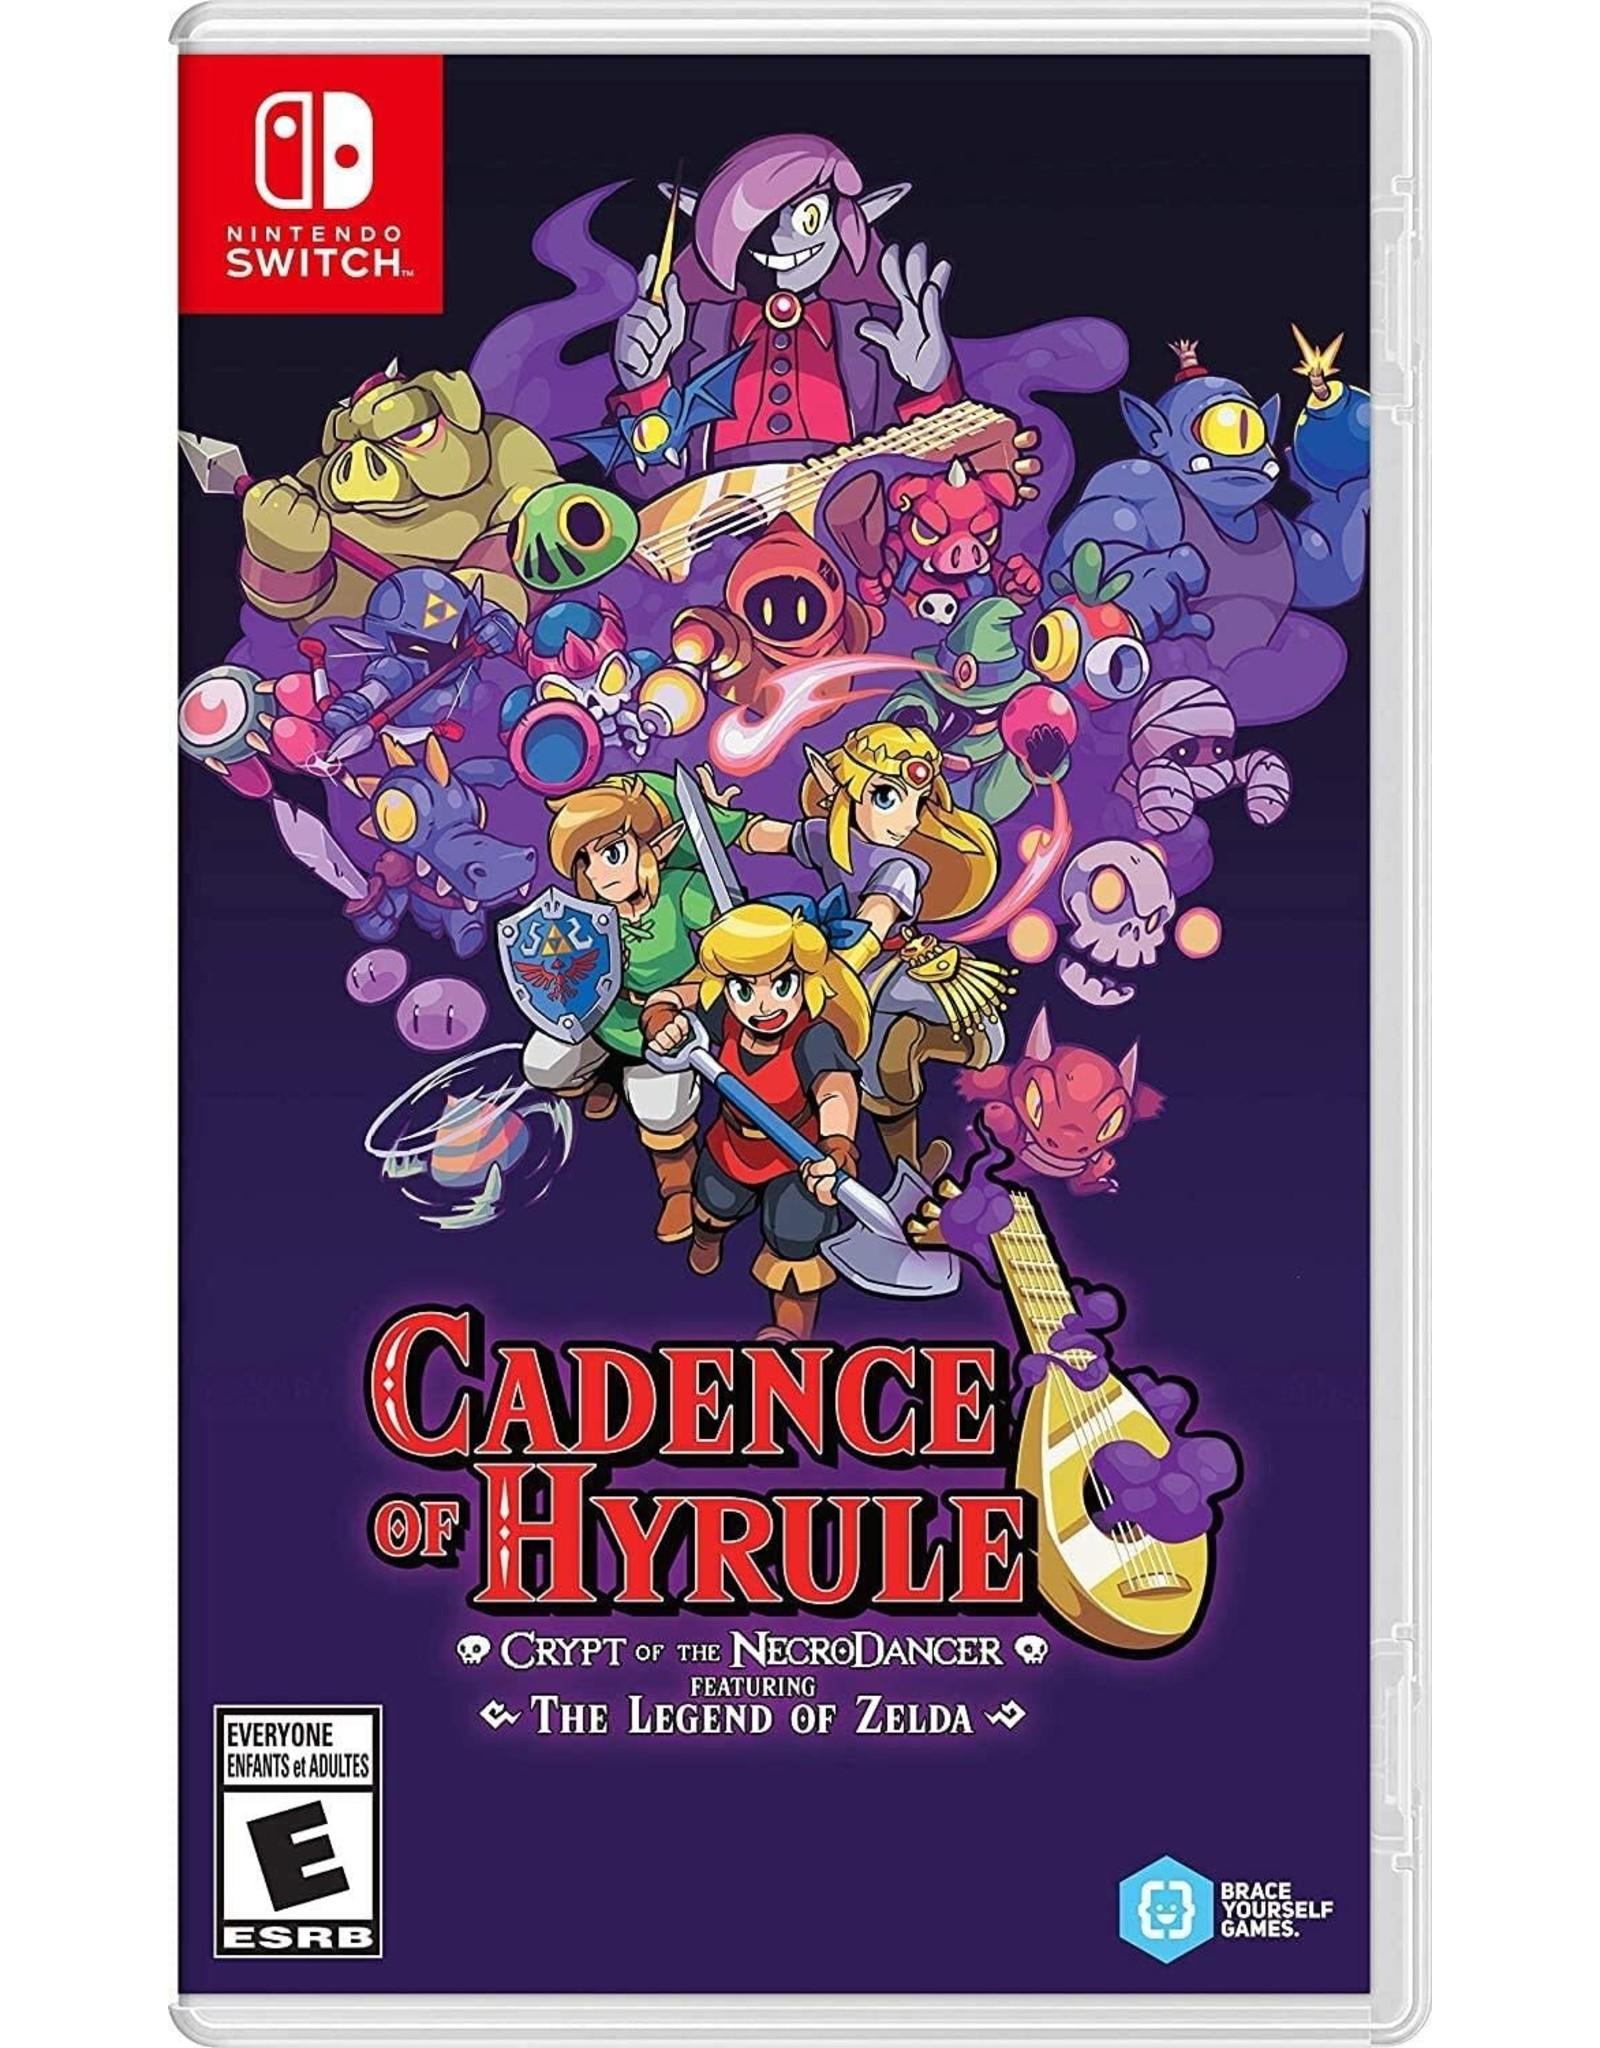 Nintendo Switch Cadence of Hyrule